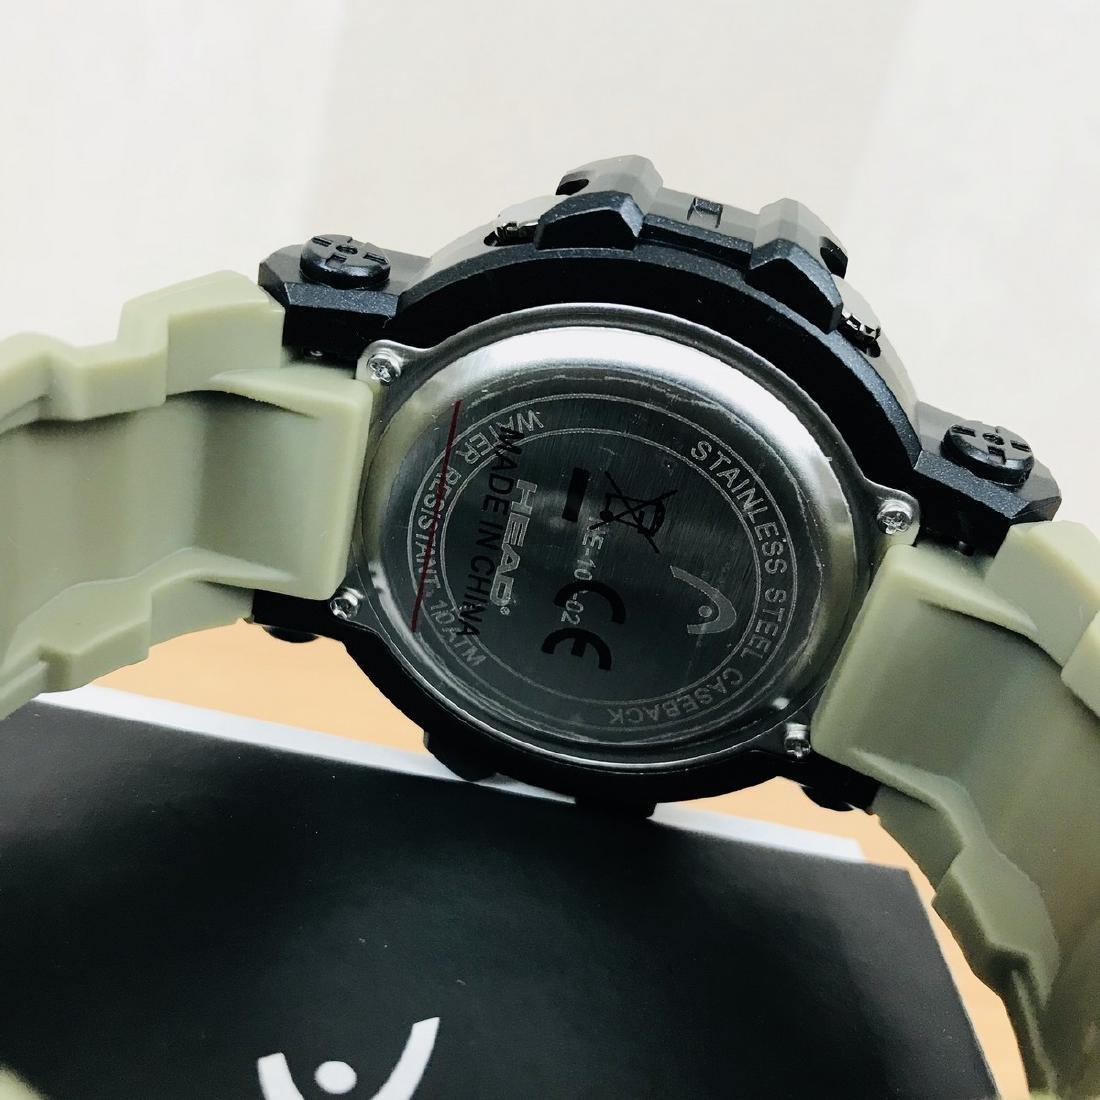 HEAD – World Timer Multifunction Watch - 7